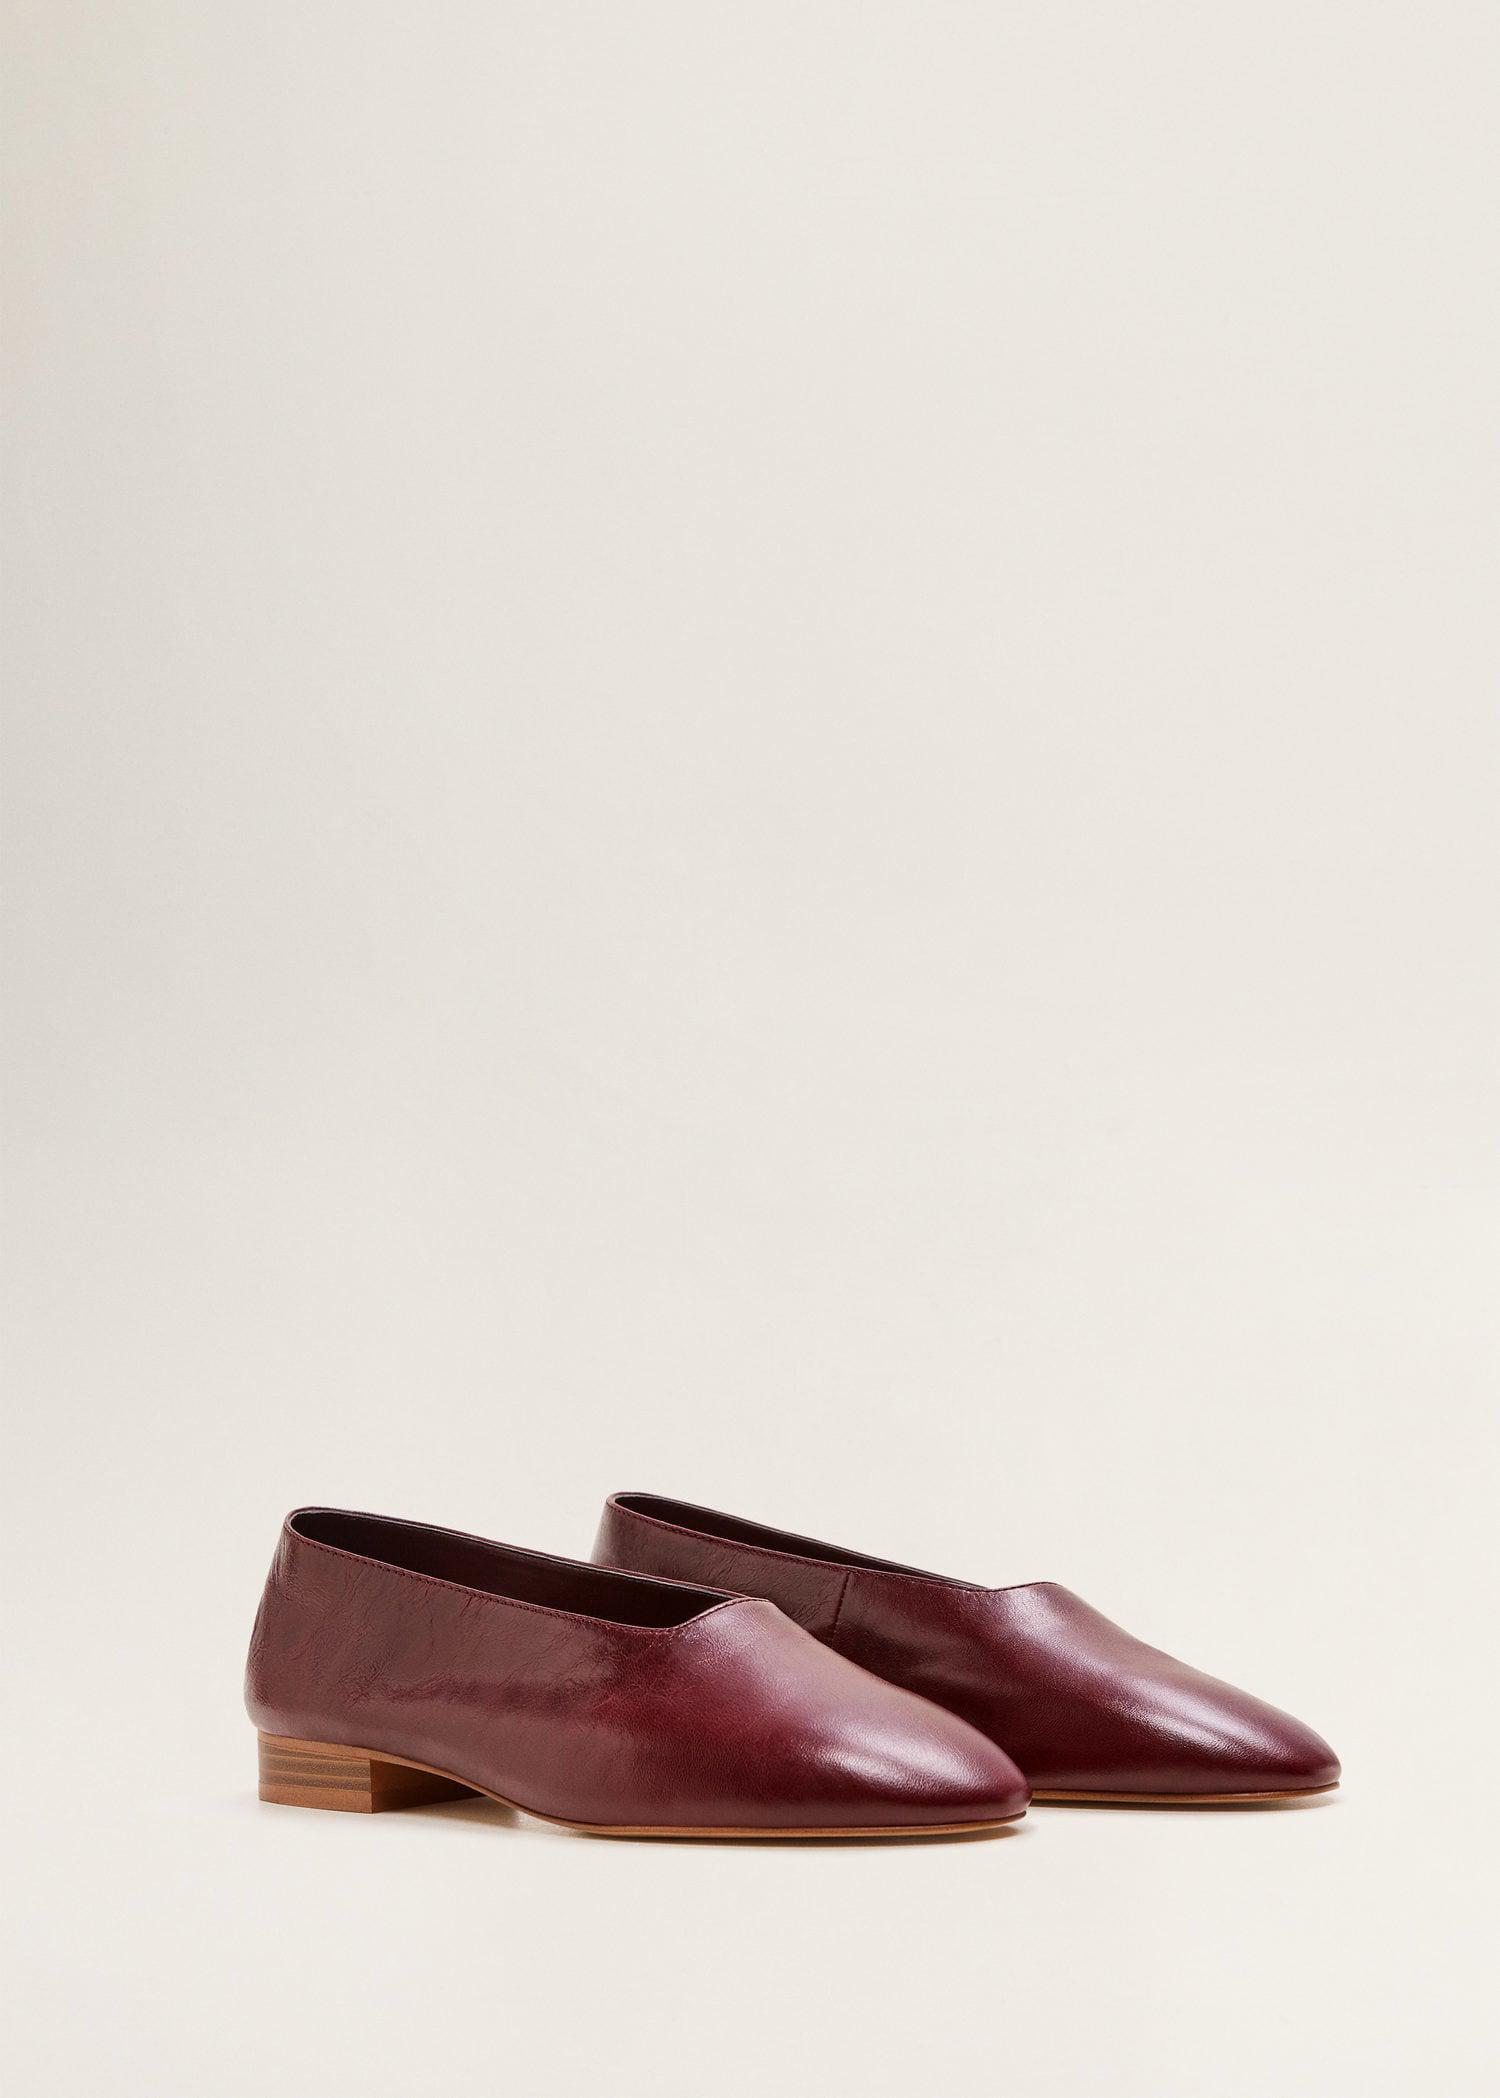 Mango Leather Flat Shoes - Lyst